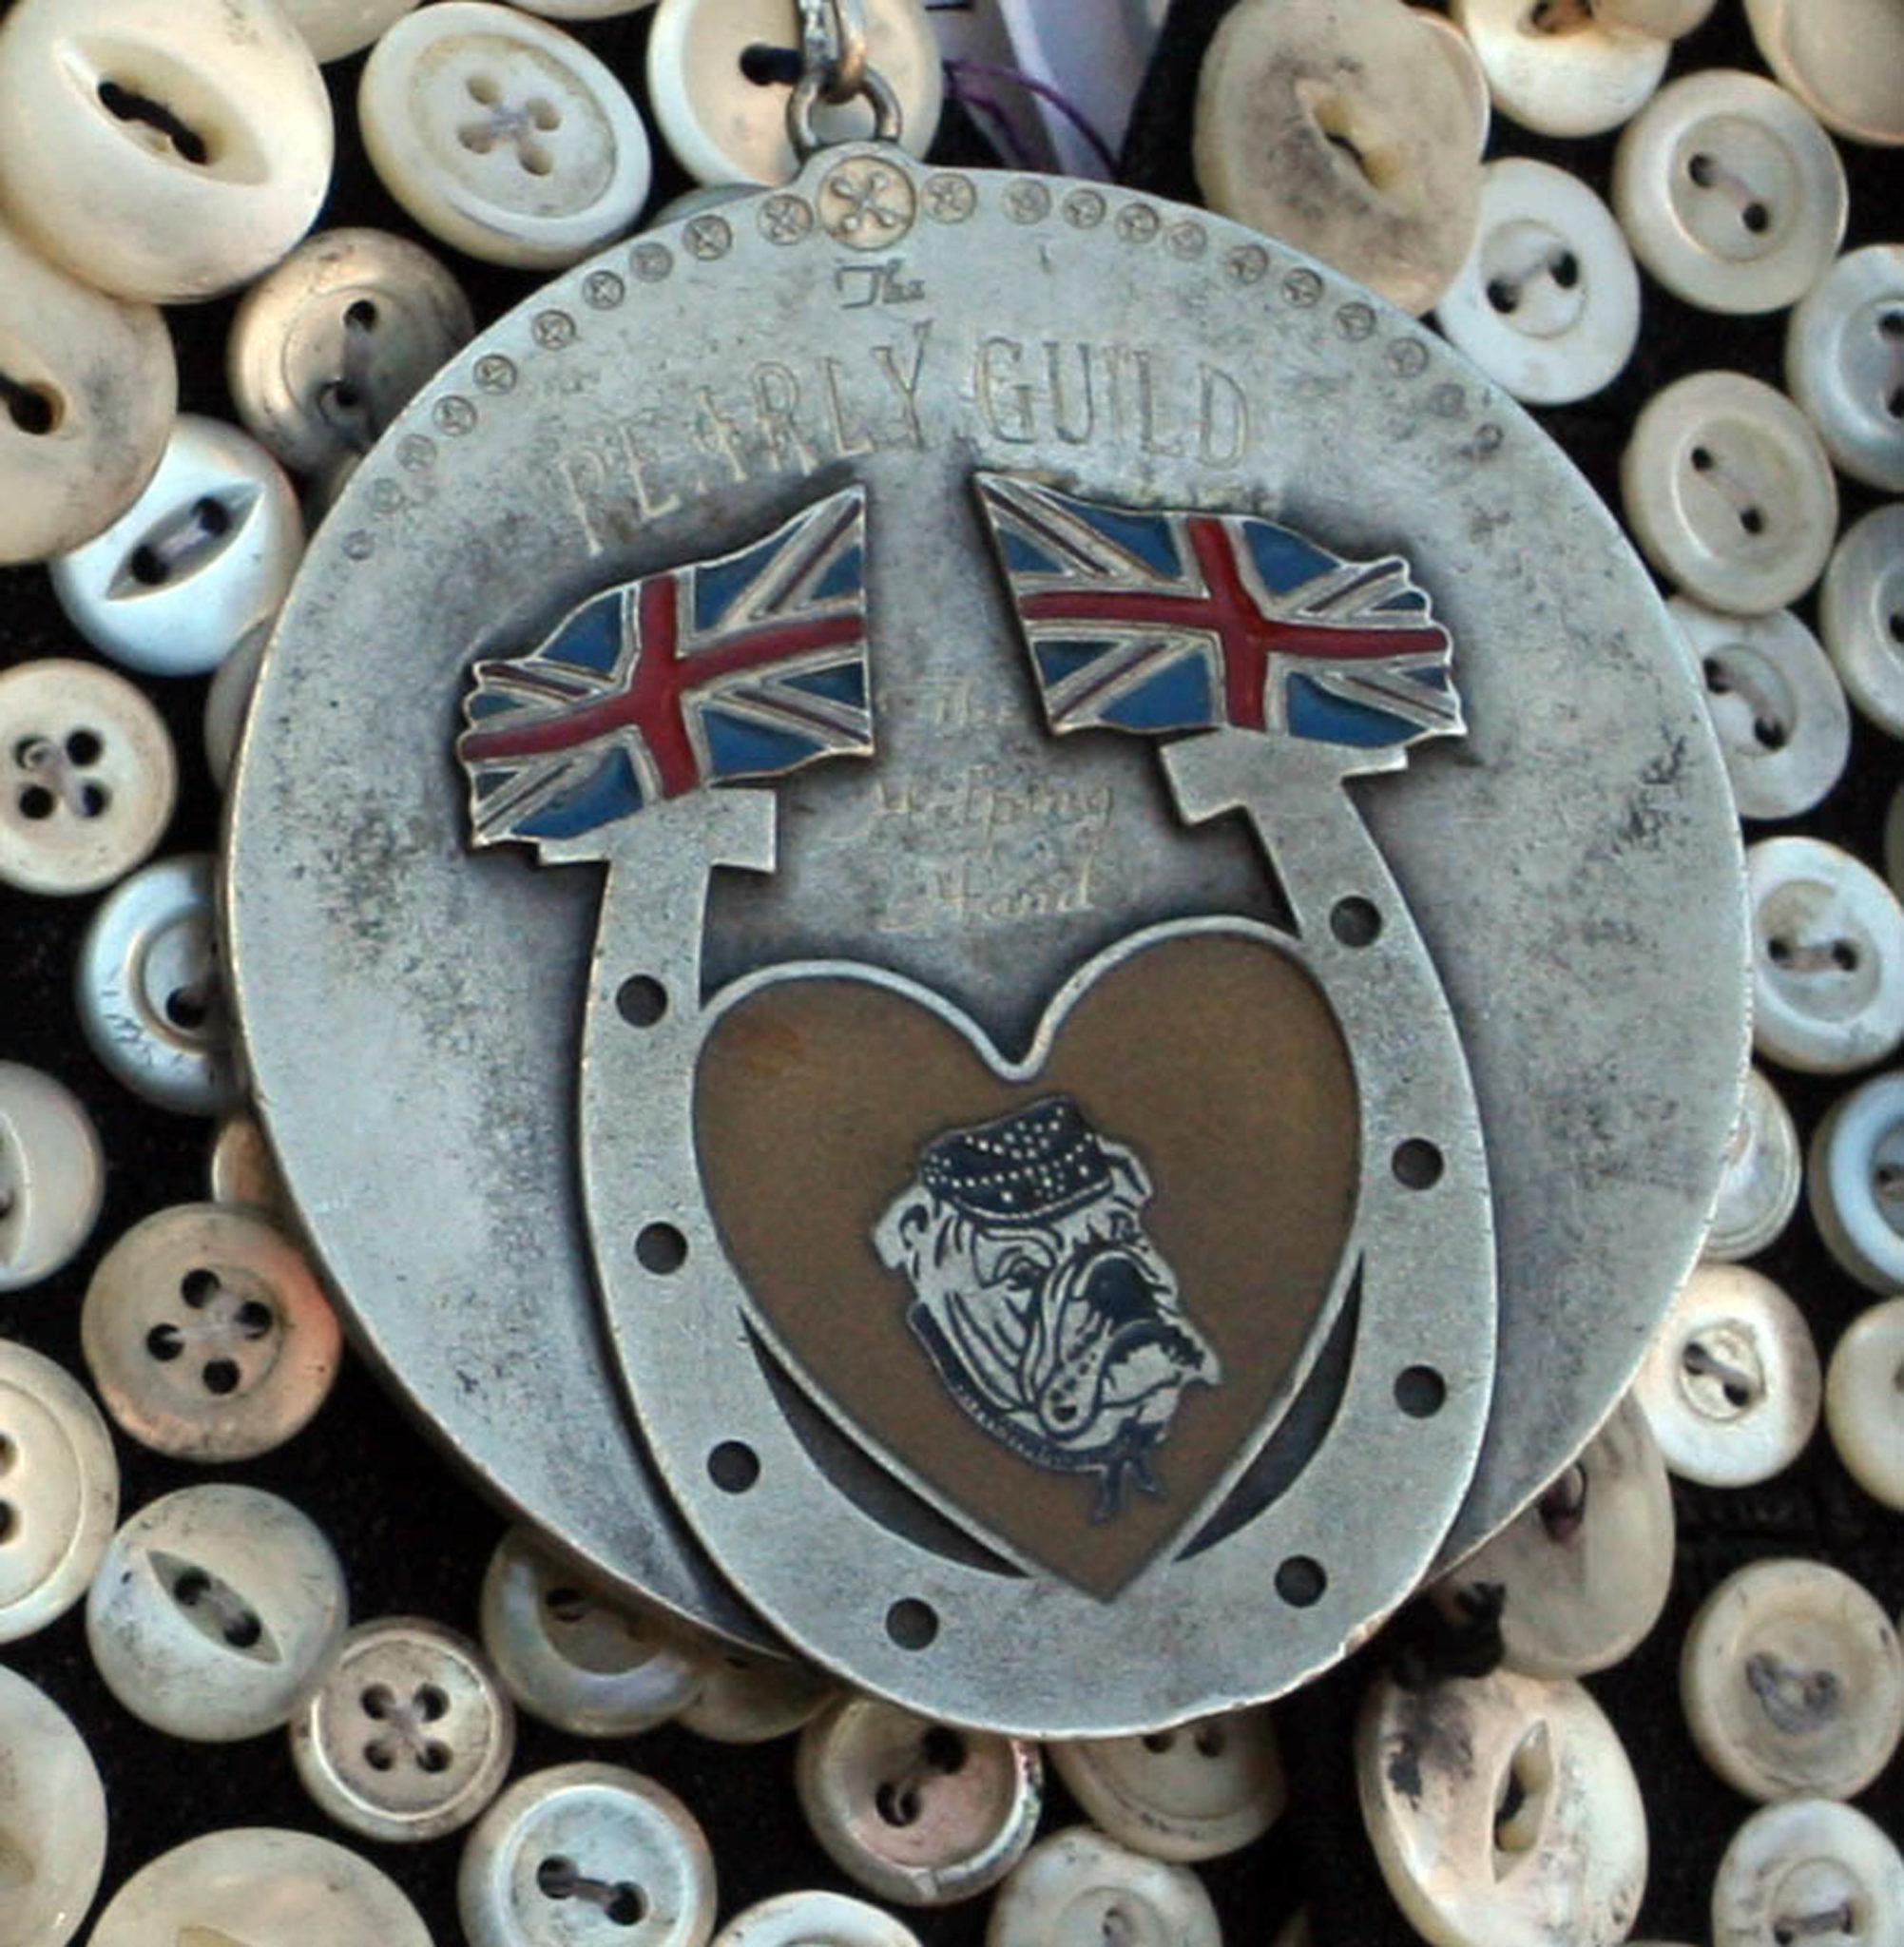 Crown, crown design, Elizabeth Design, Bearskin Design, Soldier Design, Crown Design, Crown, Elizabeth Design, Dogtooth Design, Staffie, Staffie Design, Claire Swindale Interior Design, wallpapers, fabrics, textiles, made in england, designed in england, drag queens, dog tooth, repeat patterns, british, swin, british bull dog, pearly king british bull dog, claire swindale, bespoke